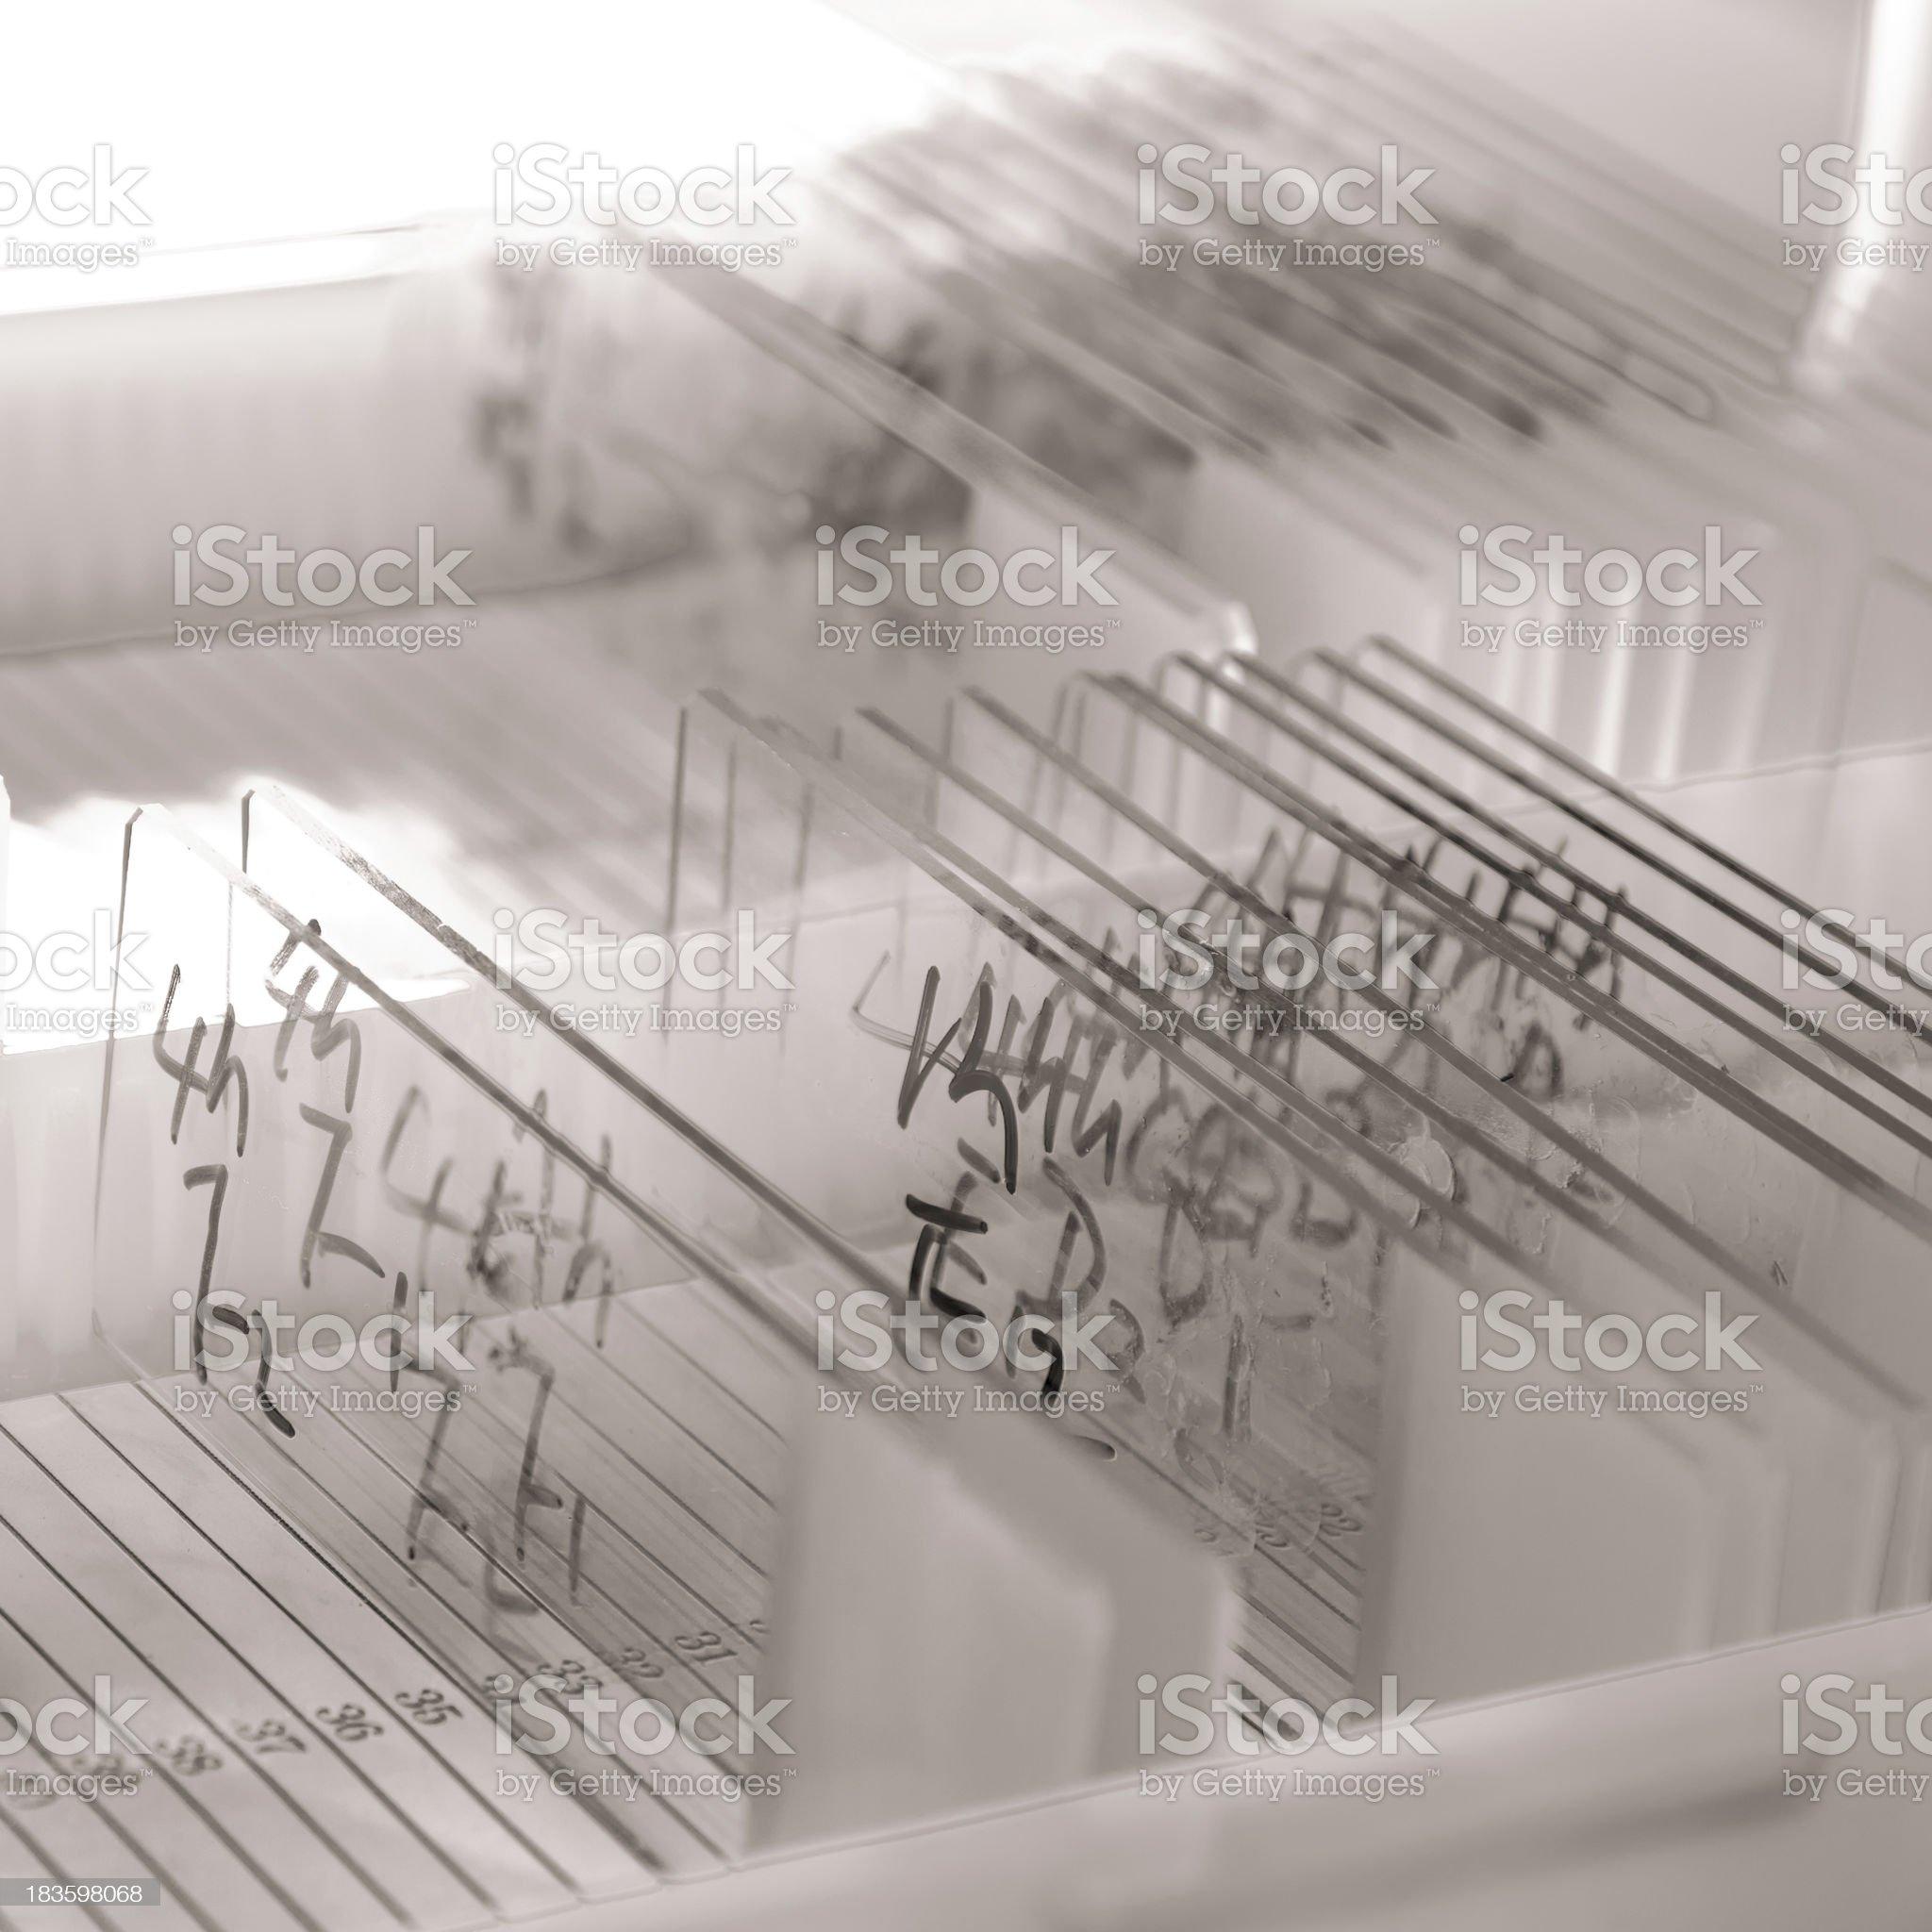 glass microscope slide royalty-free stock photo